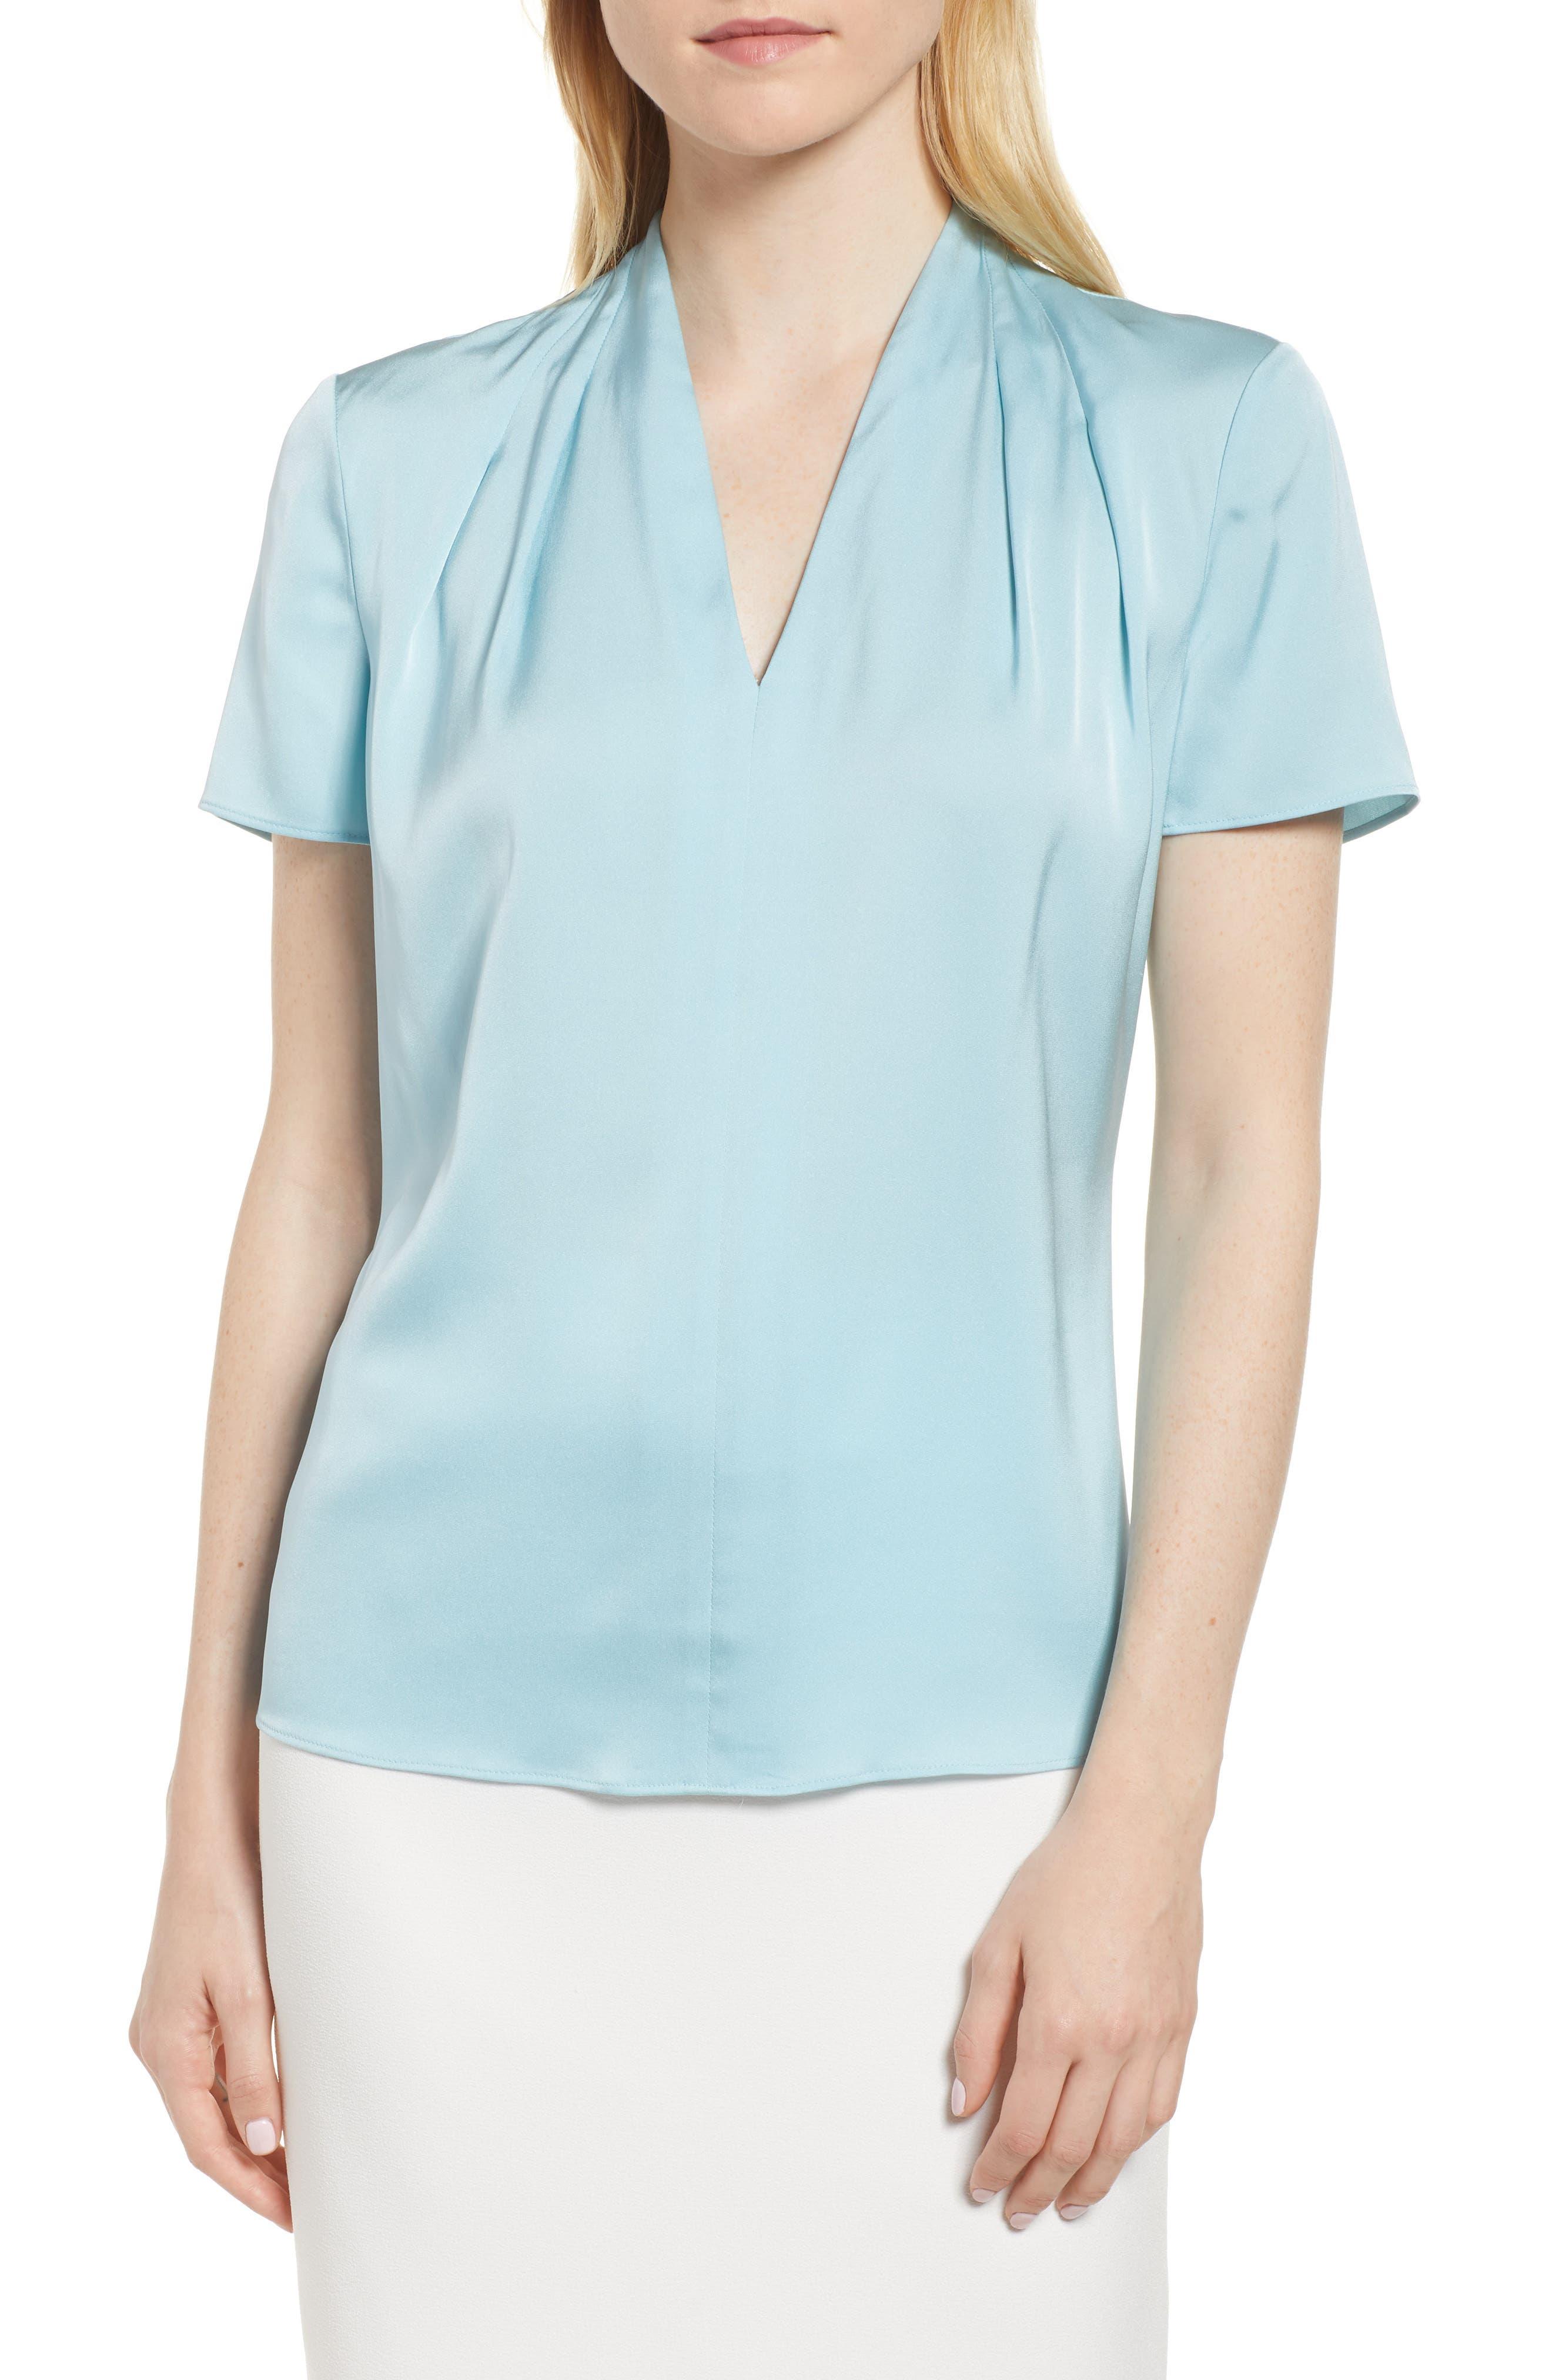 Insina Stretch Silk Blouse,                             Main thumbnail 1, color,                             Lagoon Blue